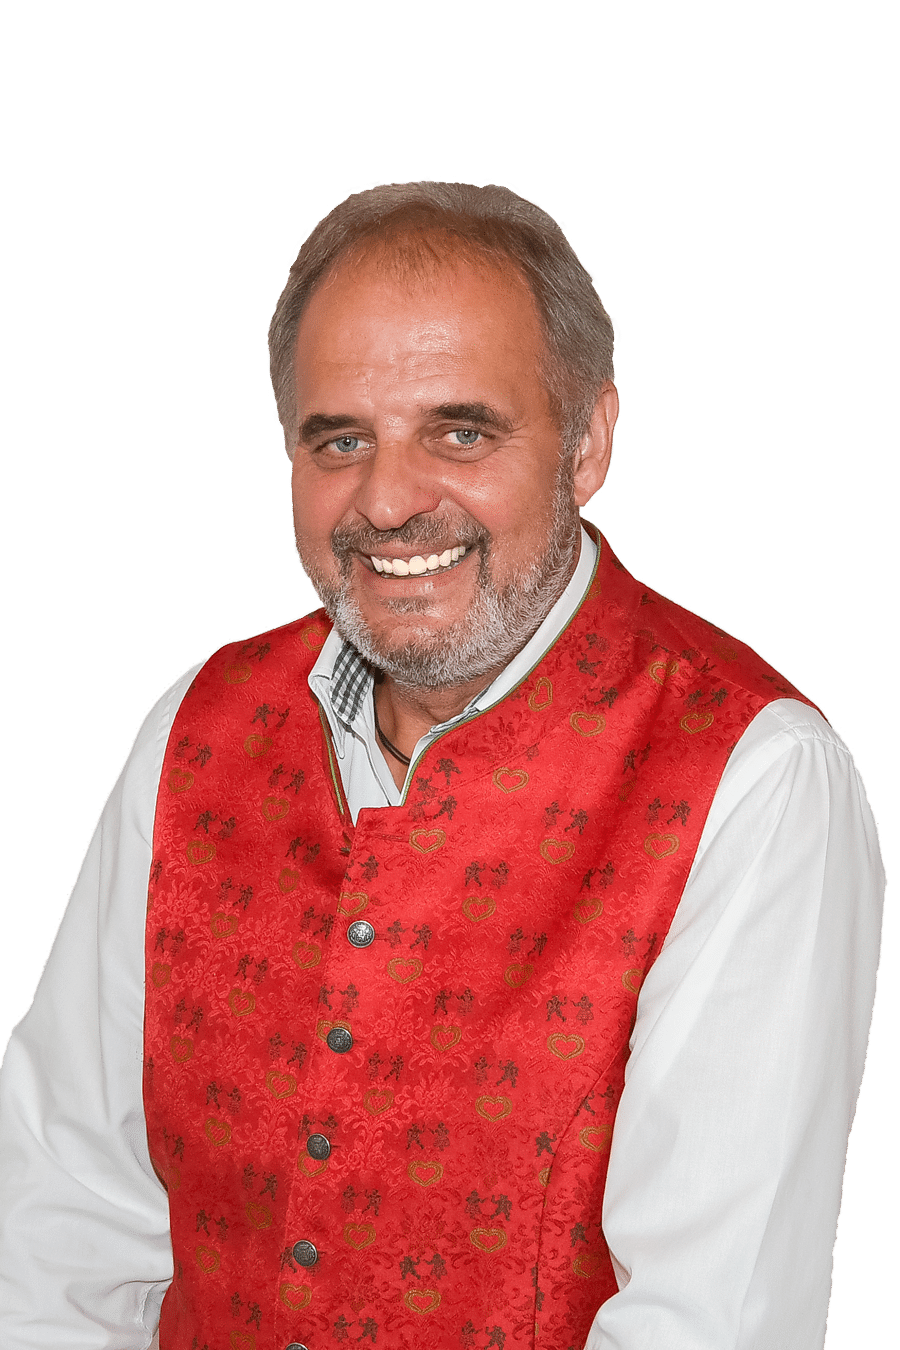 Gerhard Greistorfer